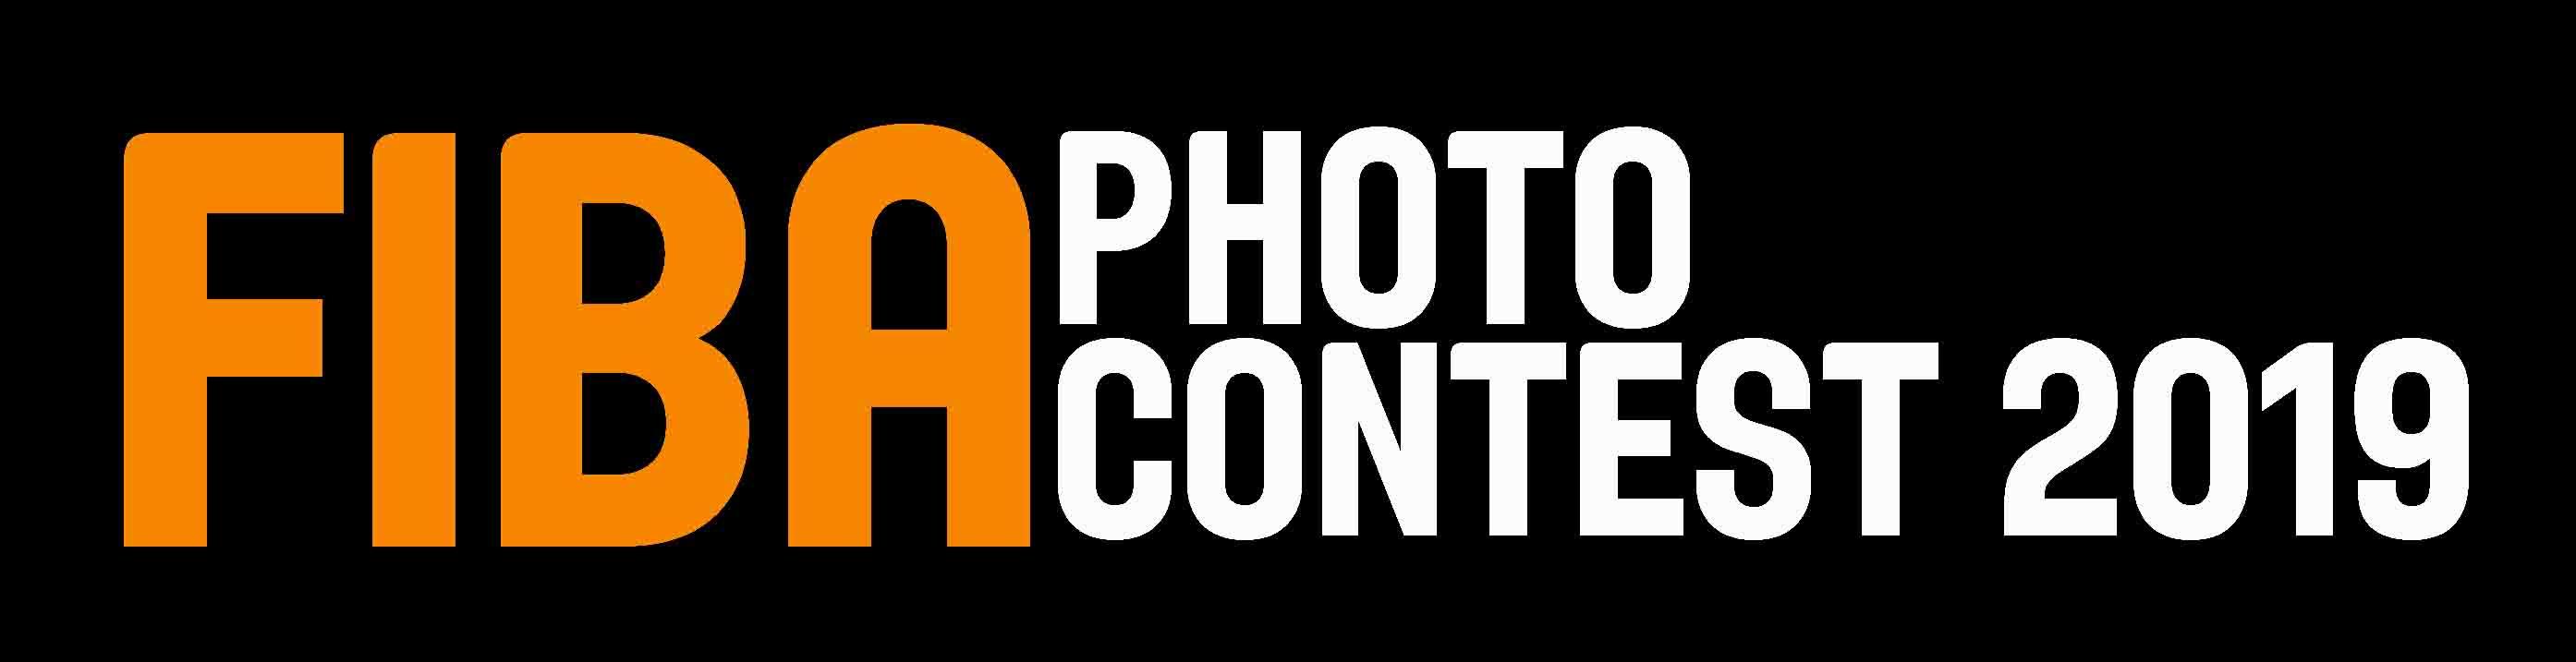 FIBA Photo Contest 2019